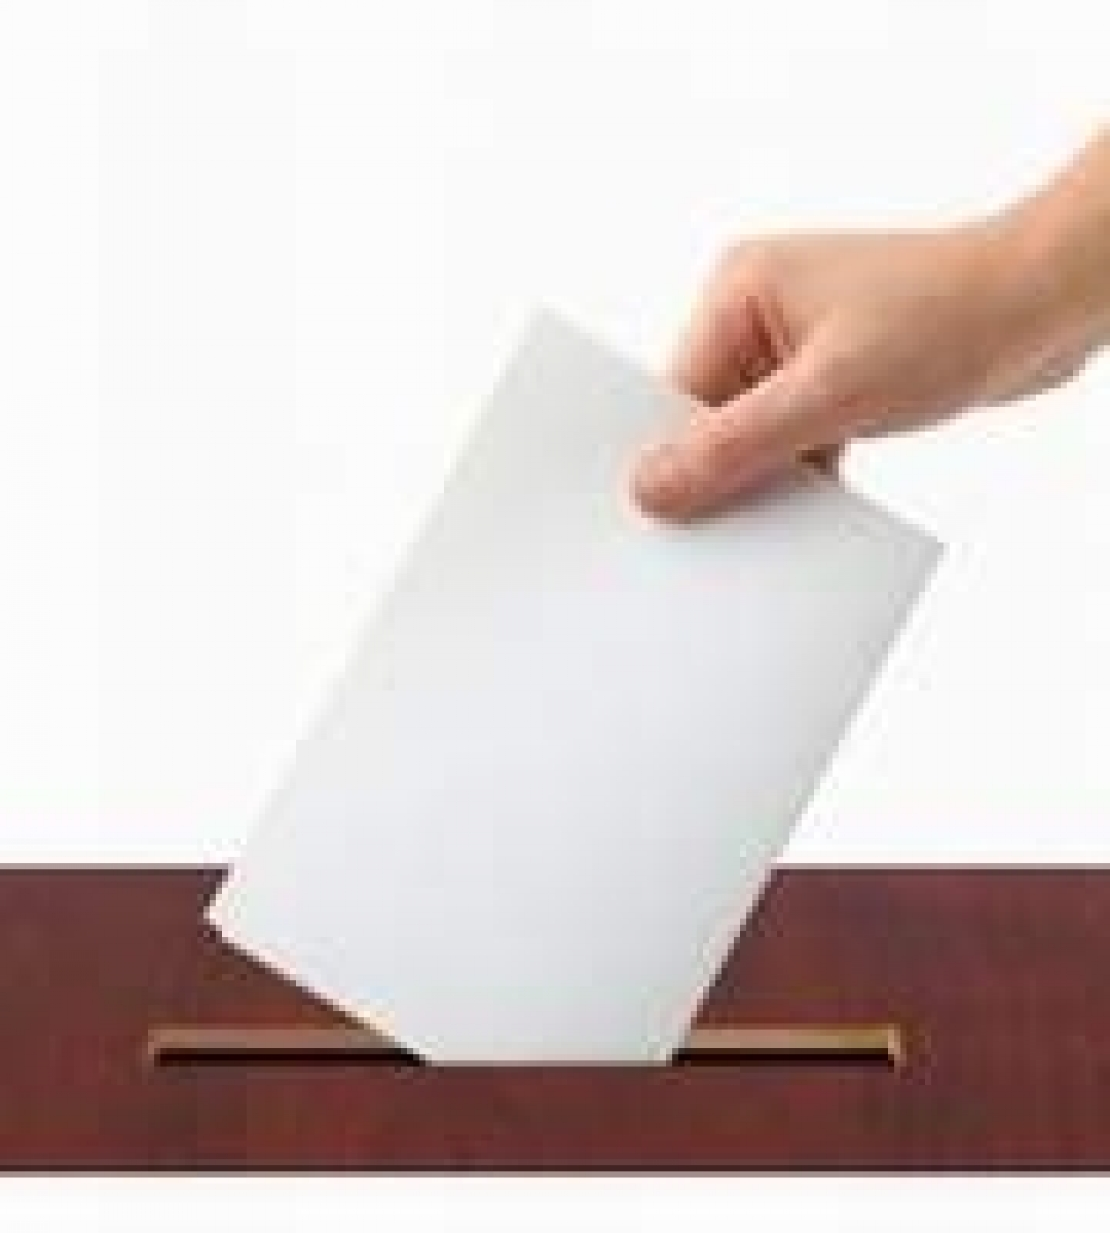 Elezioni sospese: commissariare l'Epap subito!